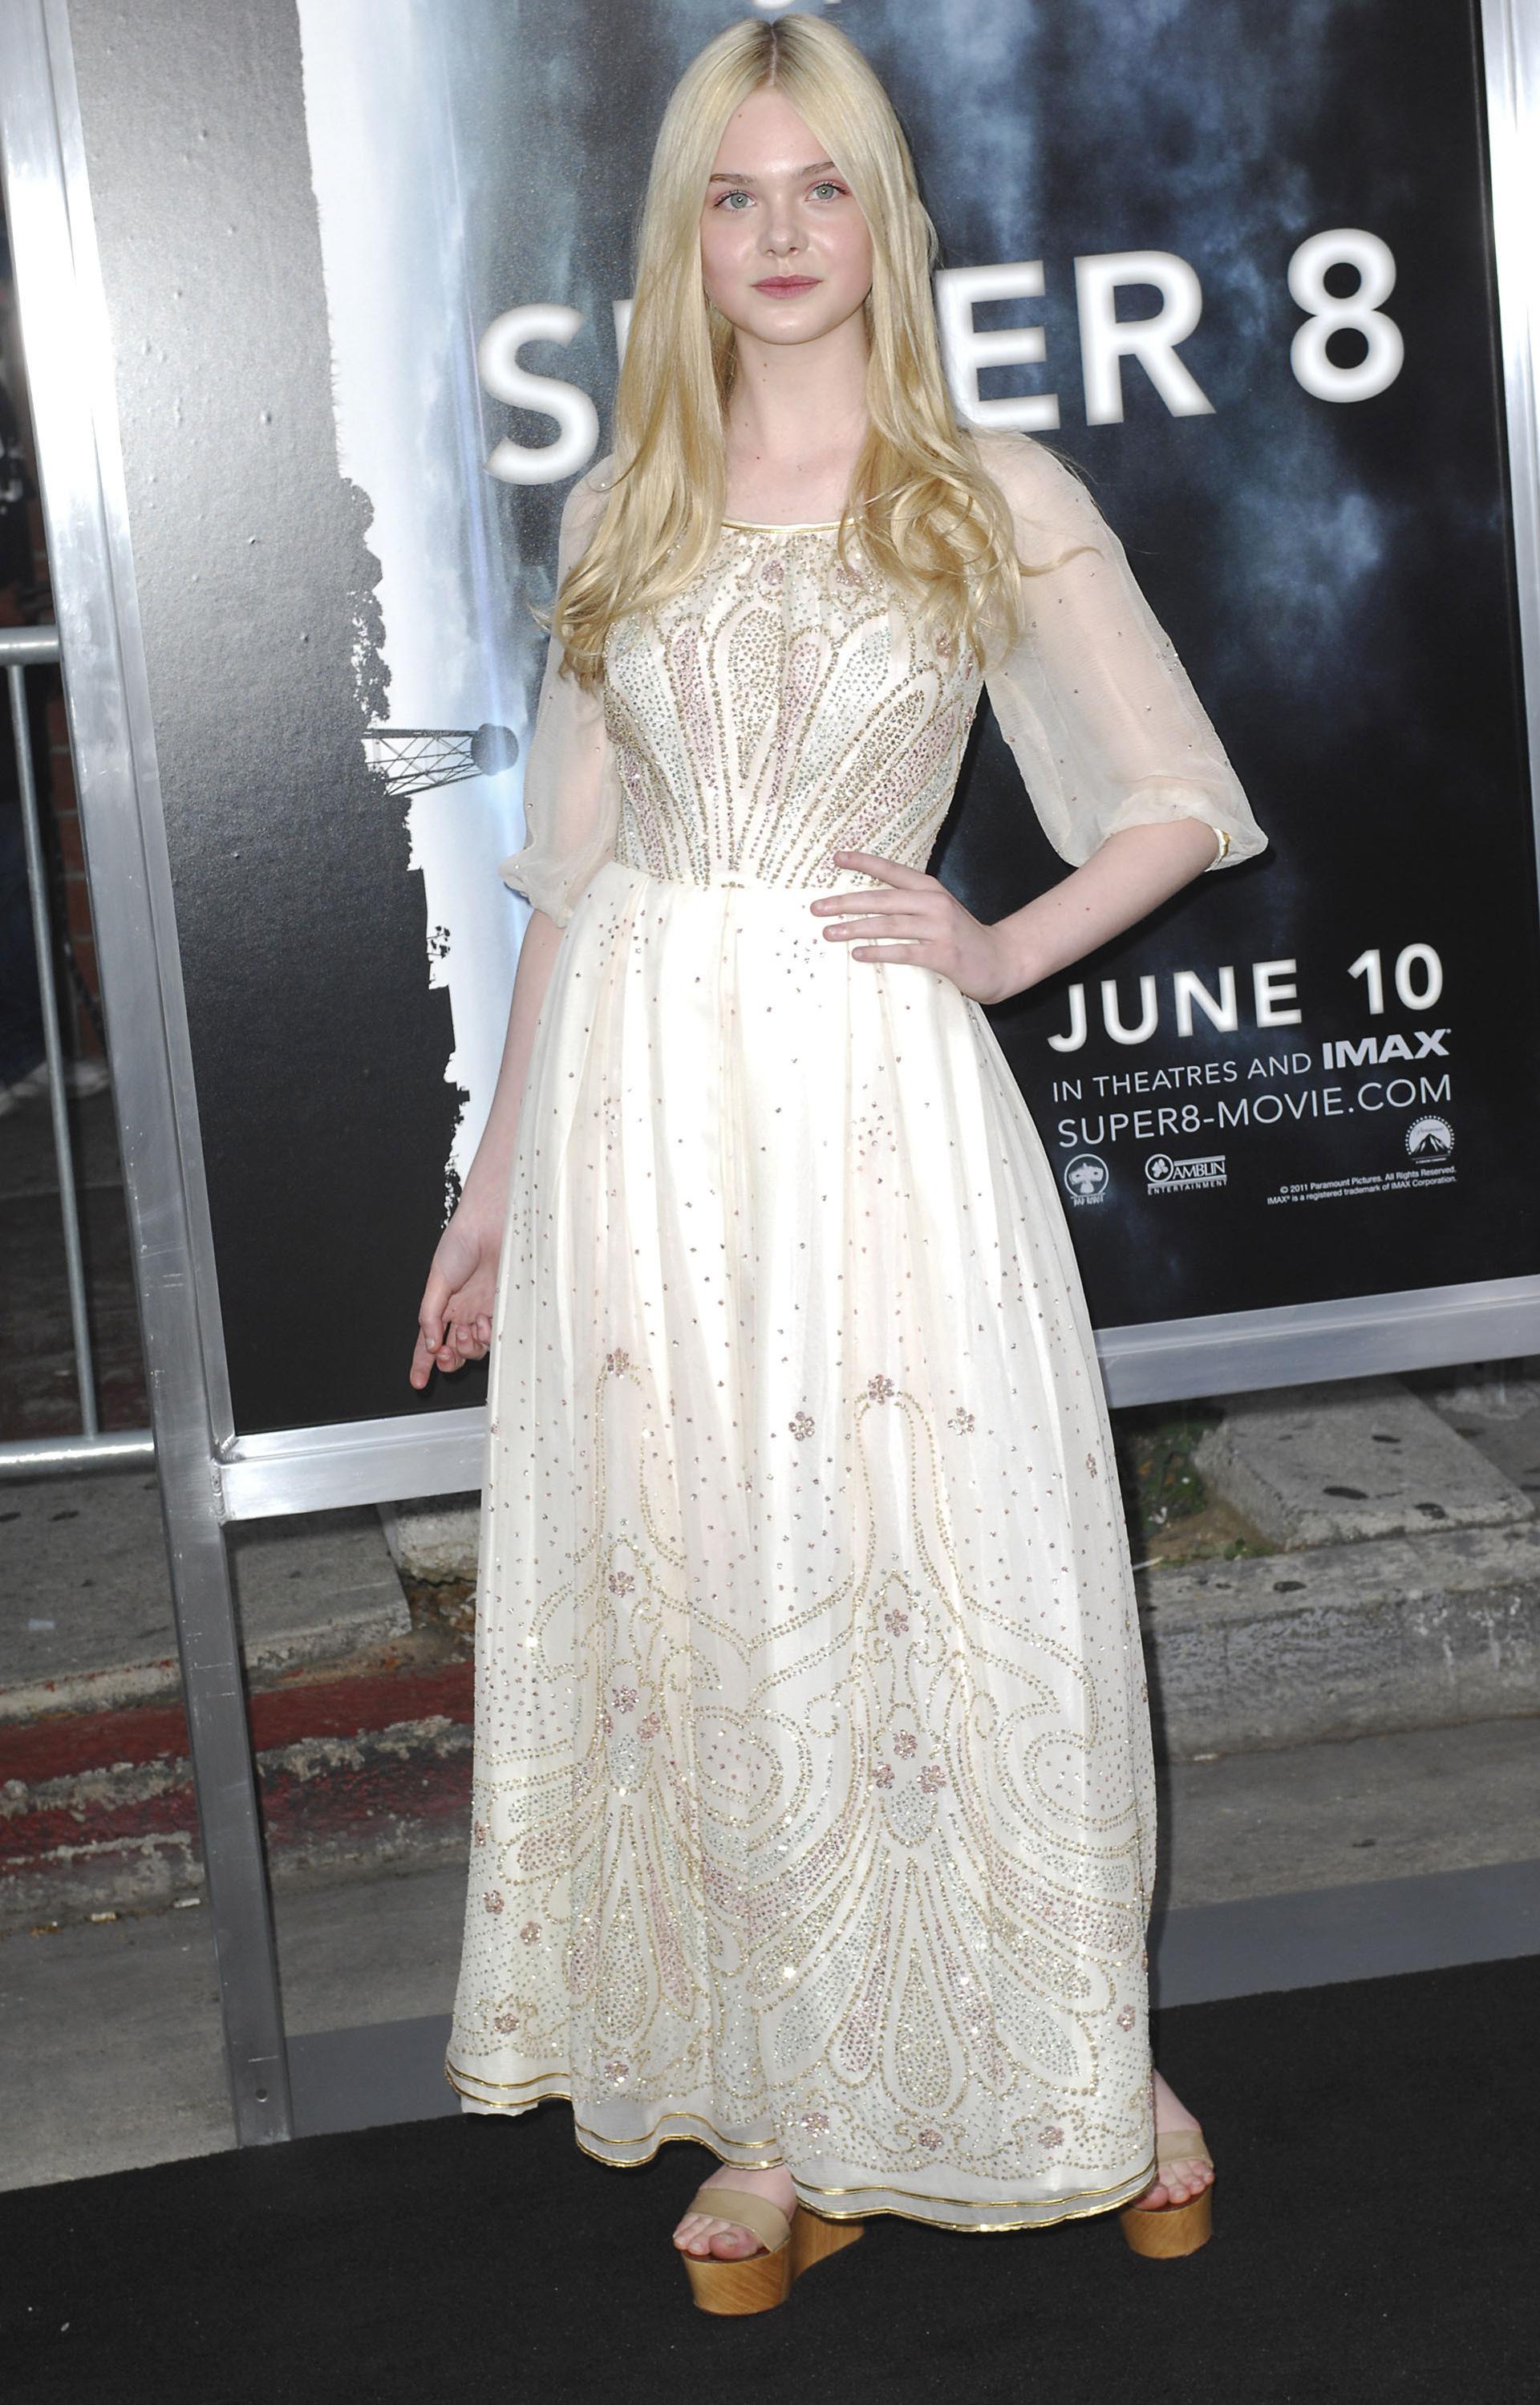 Elle Fanning wearing cream dress to Super 8 premiere